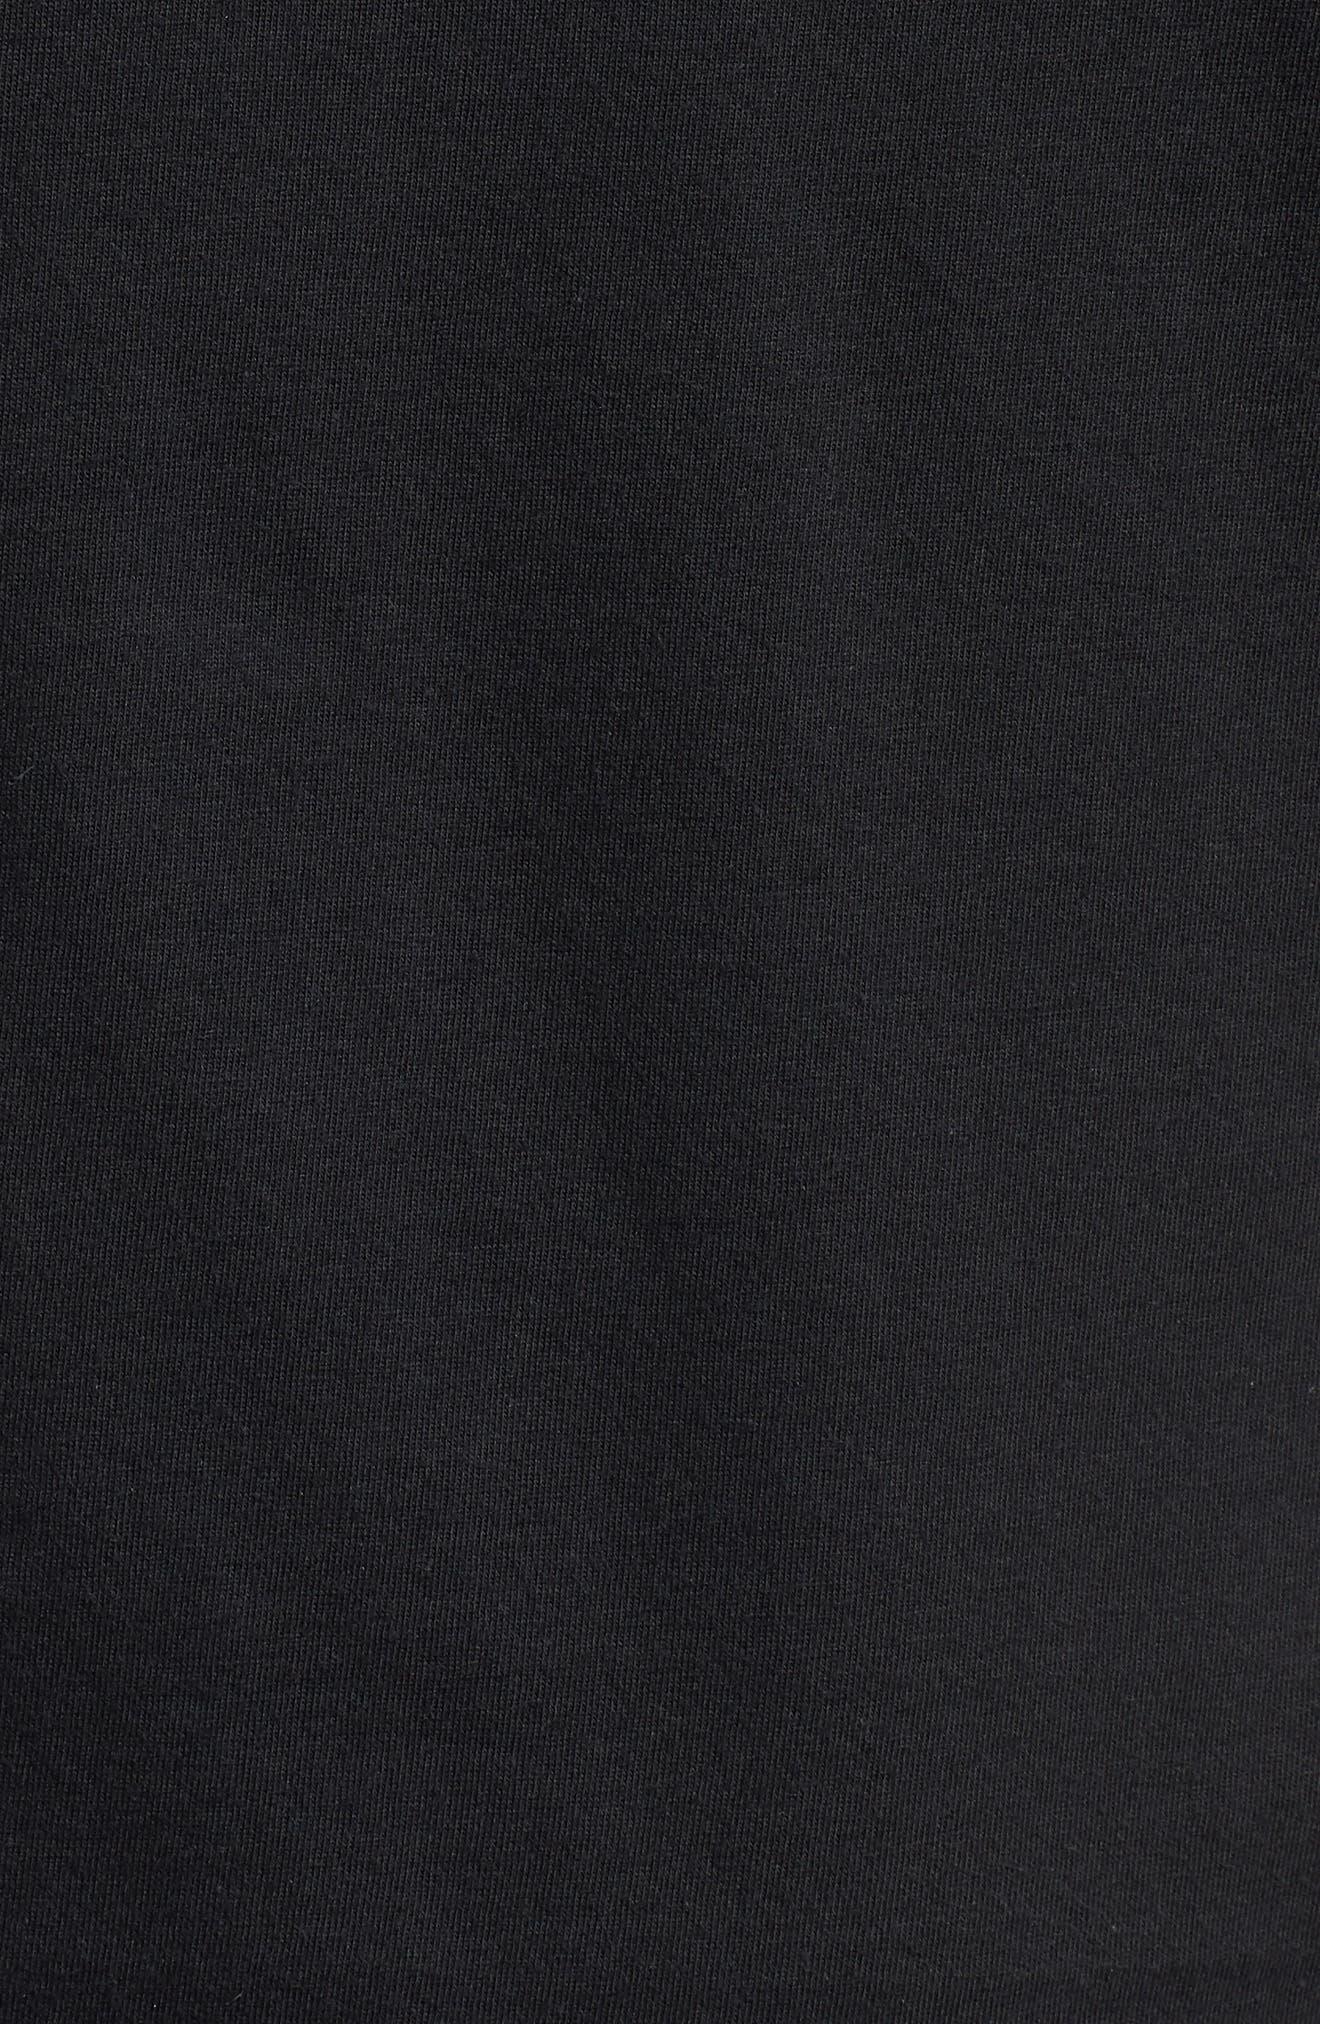 Sportswear Futura Logo Graphic T-Shirt,                             Alternate thumbnail 5, color,                             Black/ Vintage Wine